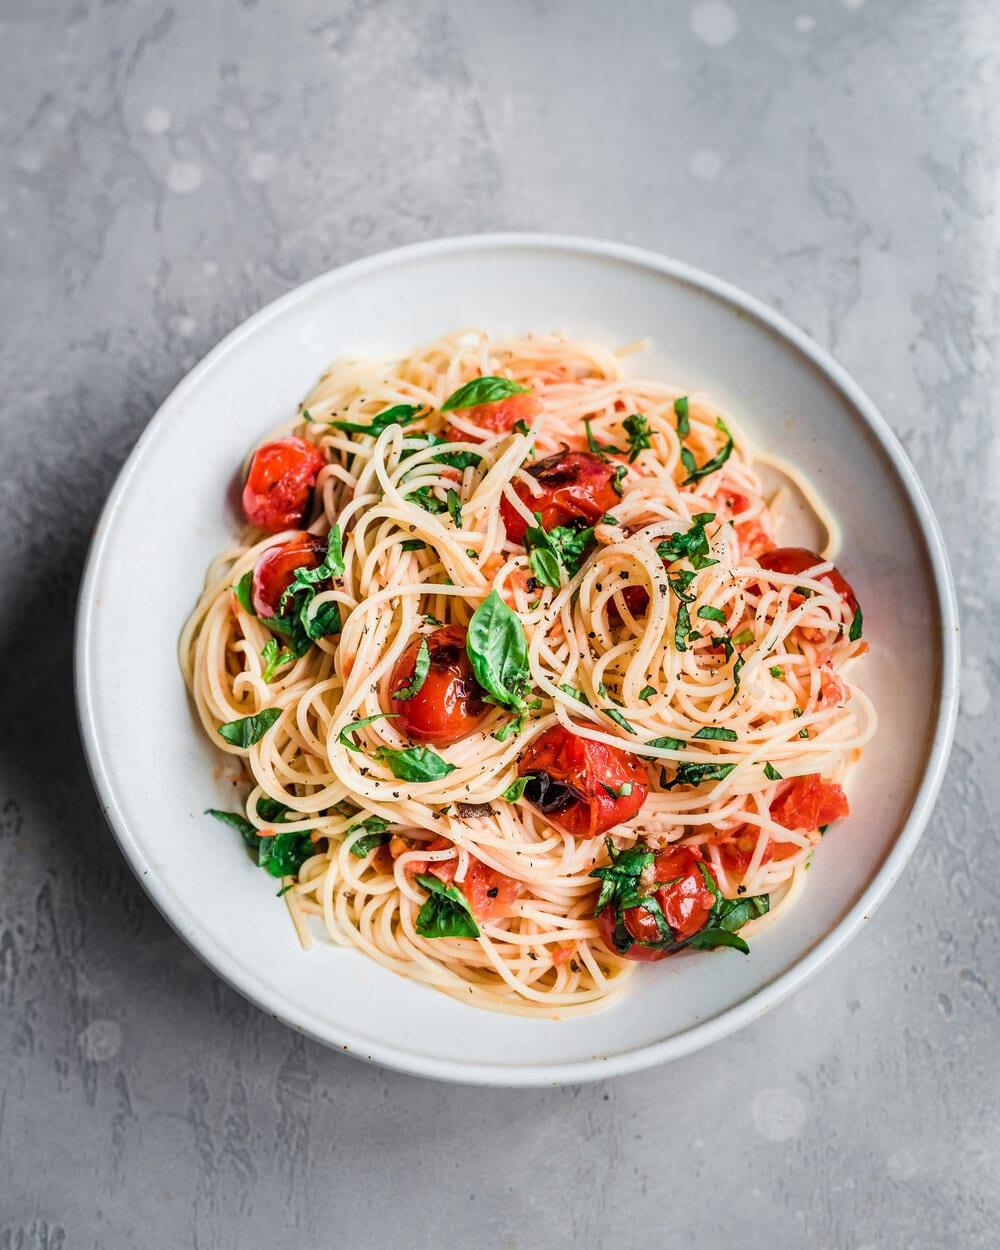 15-Minute Vegan Pasta Recipes for Summer